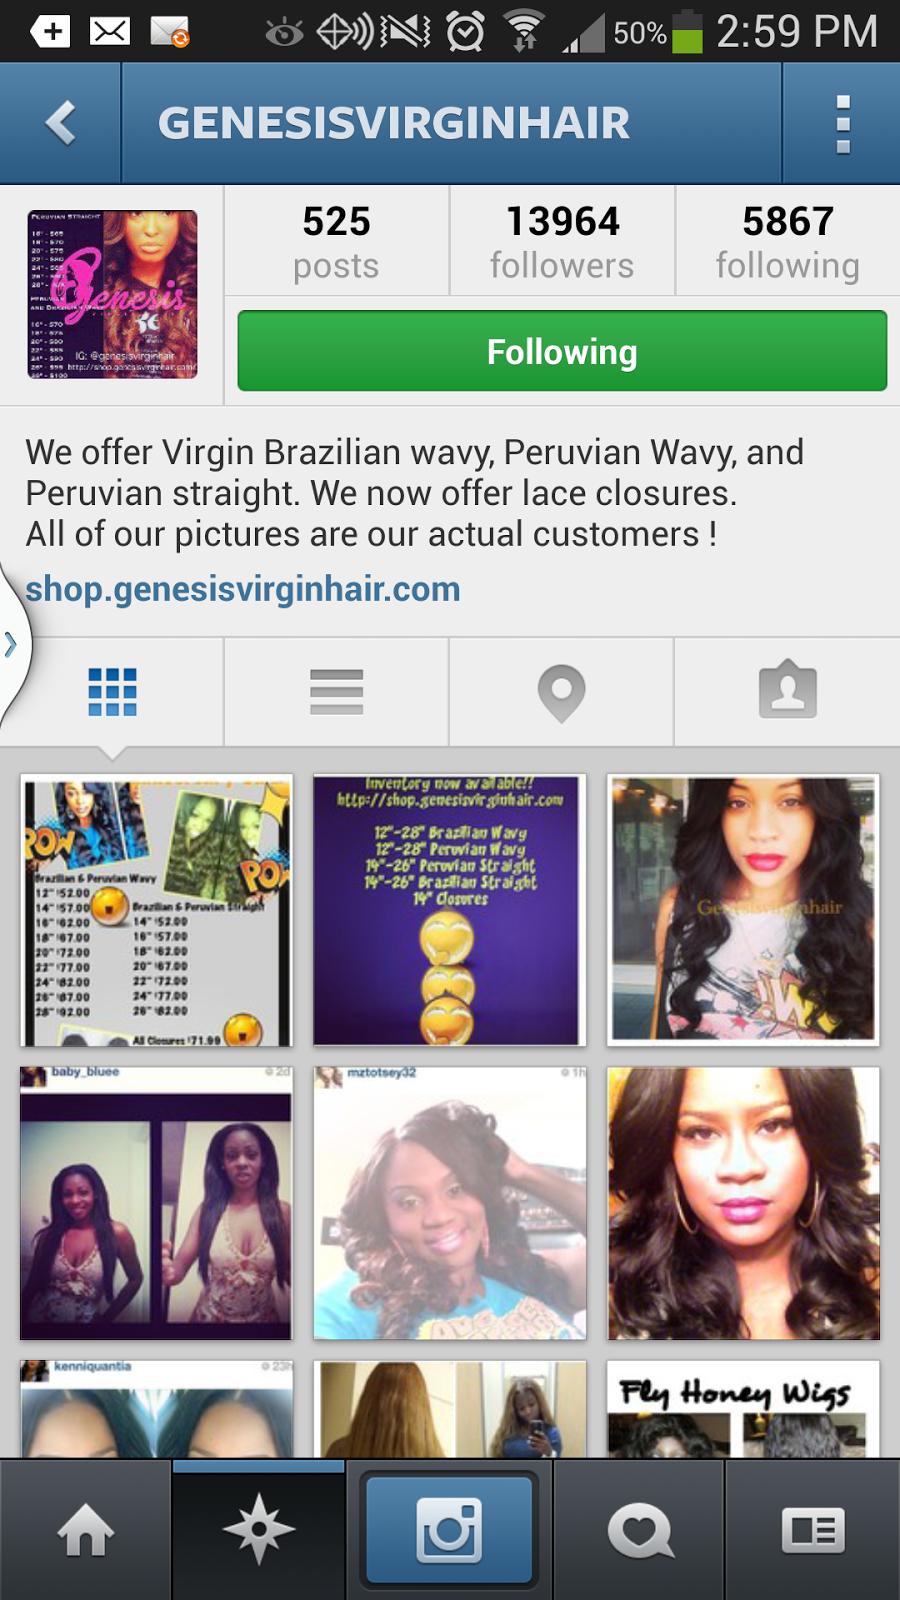 Communication Technology Genesis Virgin Hair A Organization